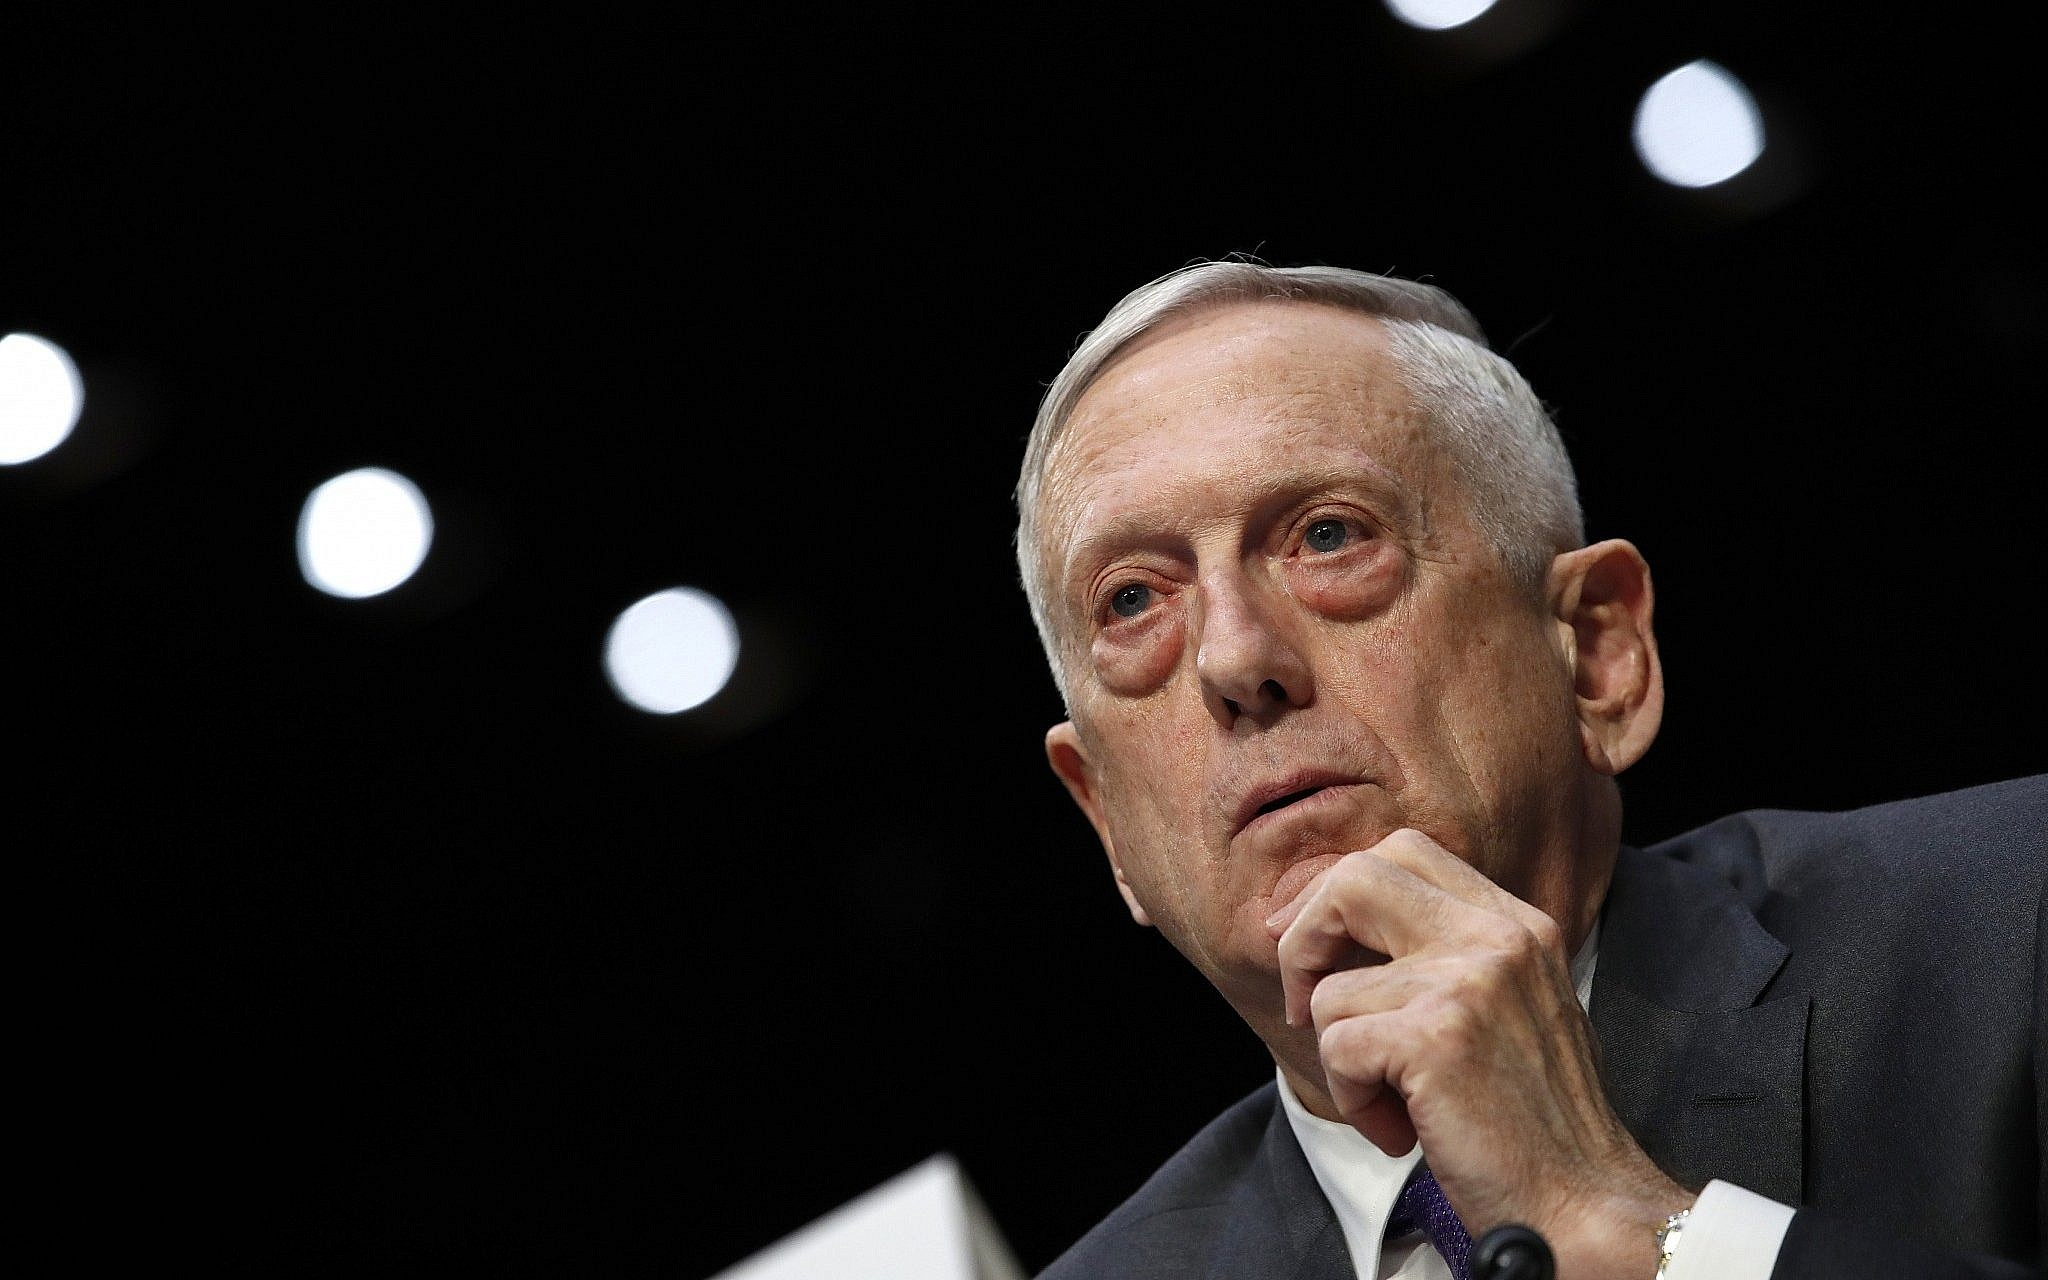 En Desaccord Avec Trump Le Chef Du Pentagone Claque La Porte The